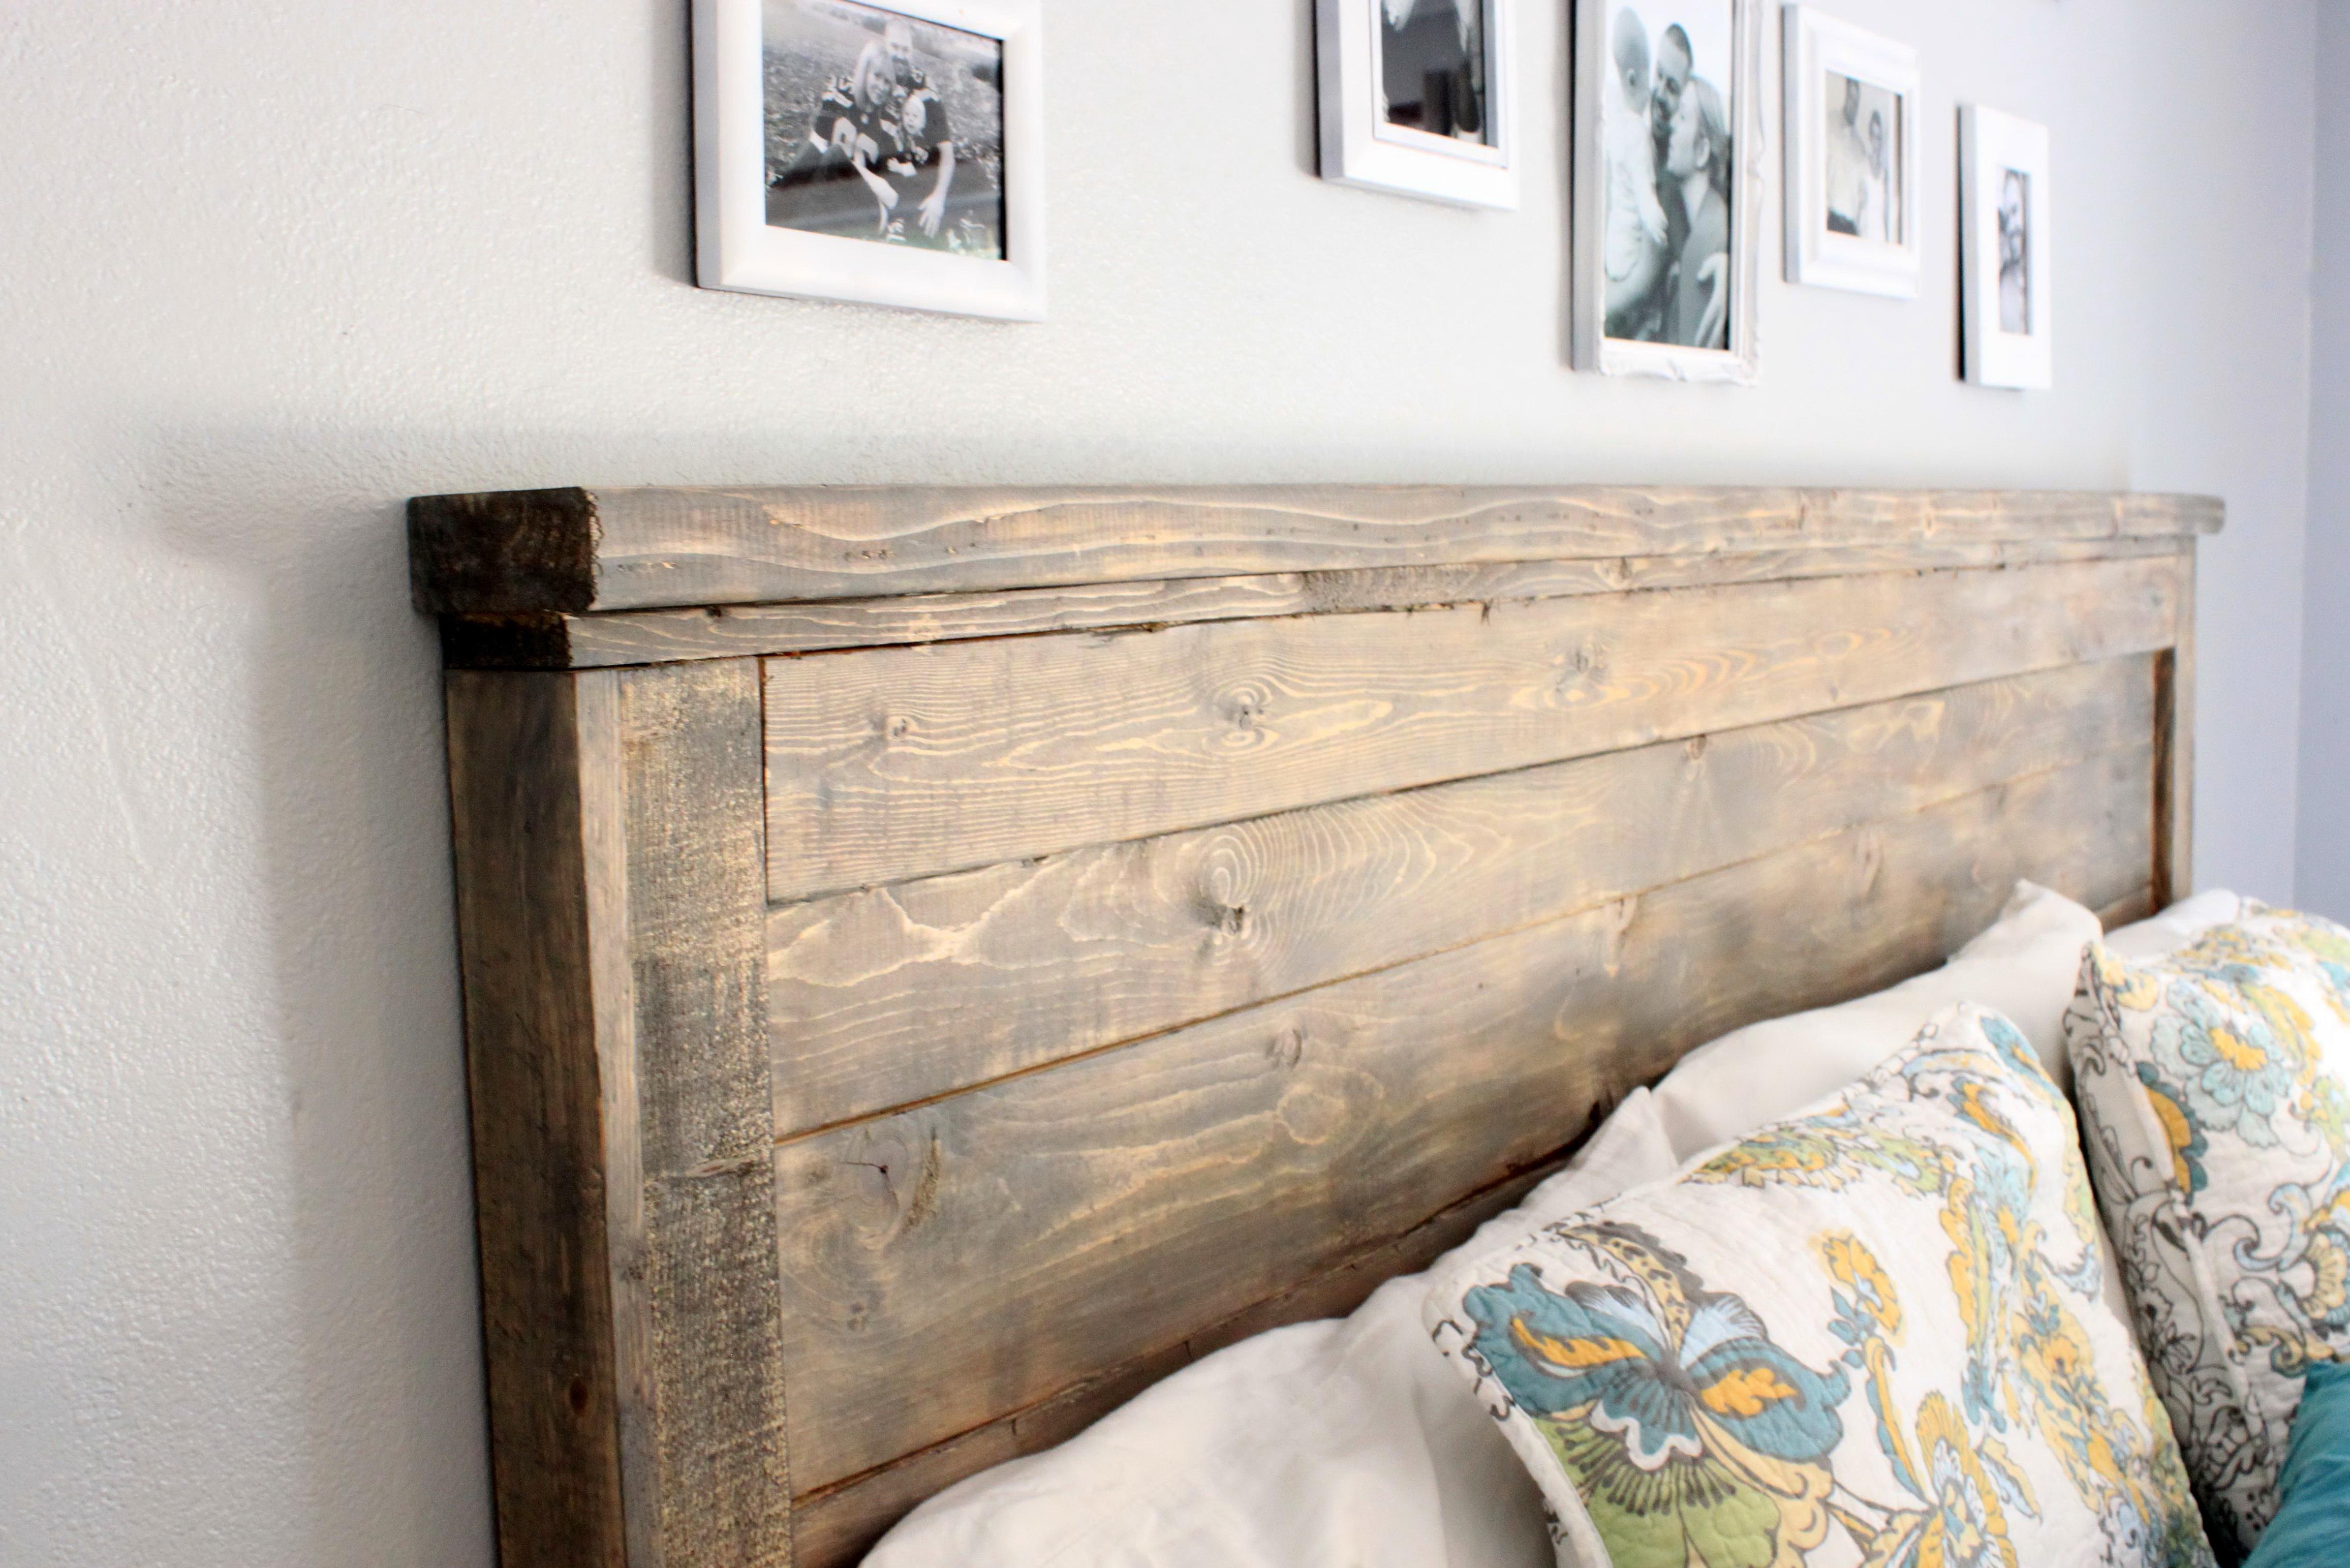 diy wood headboard king size  home design ideas - diy wood headboard king size